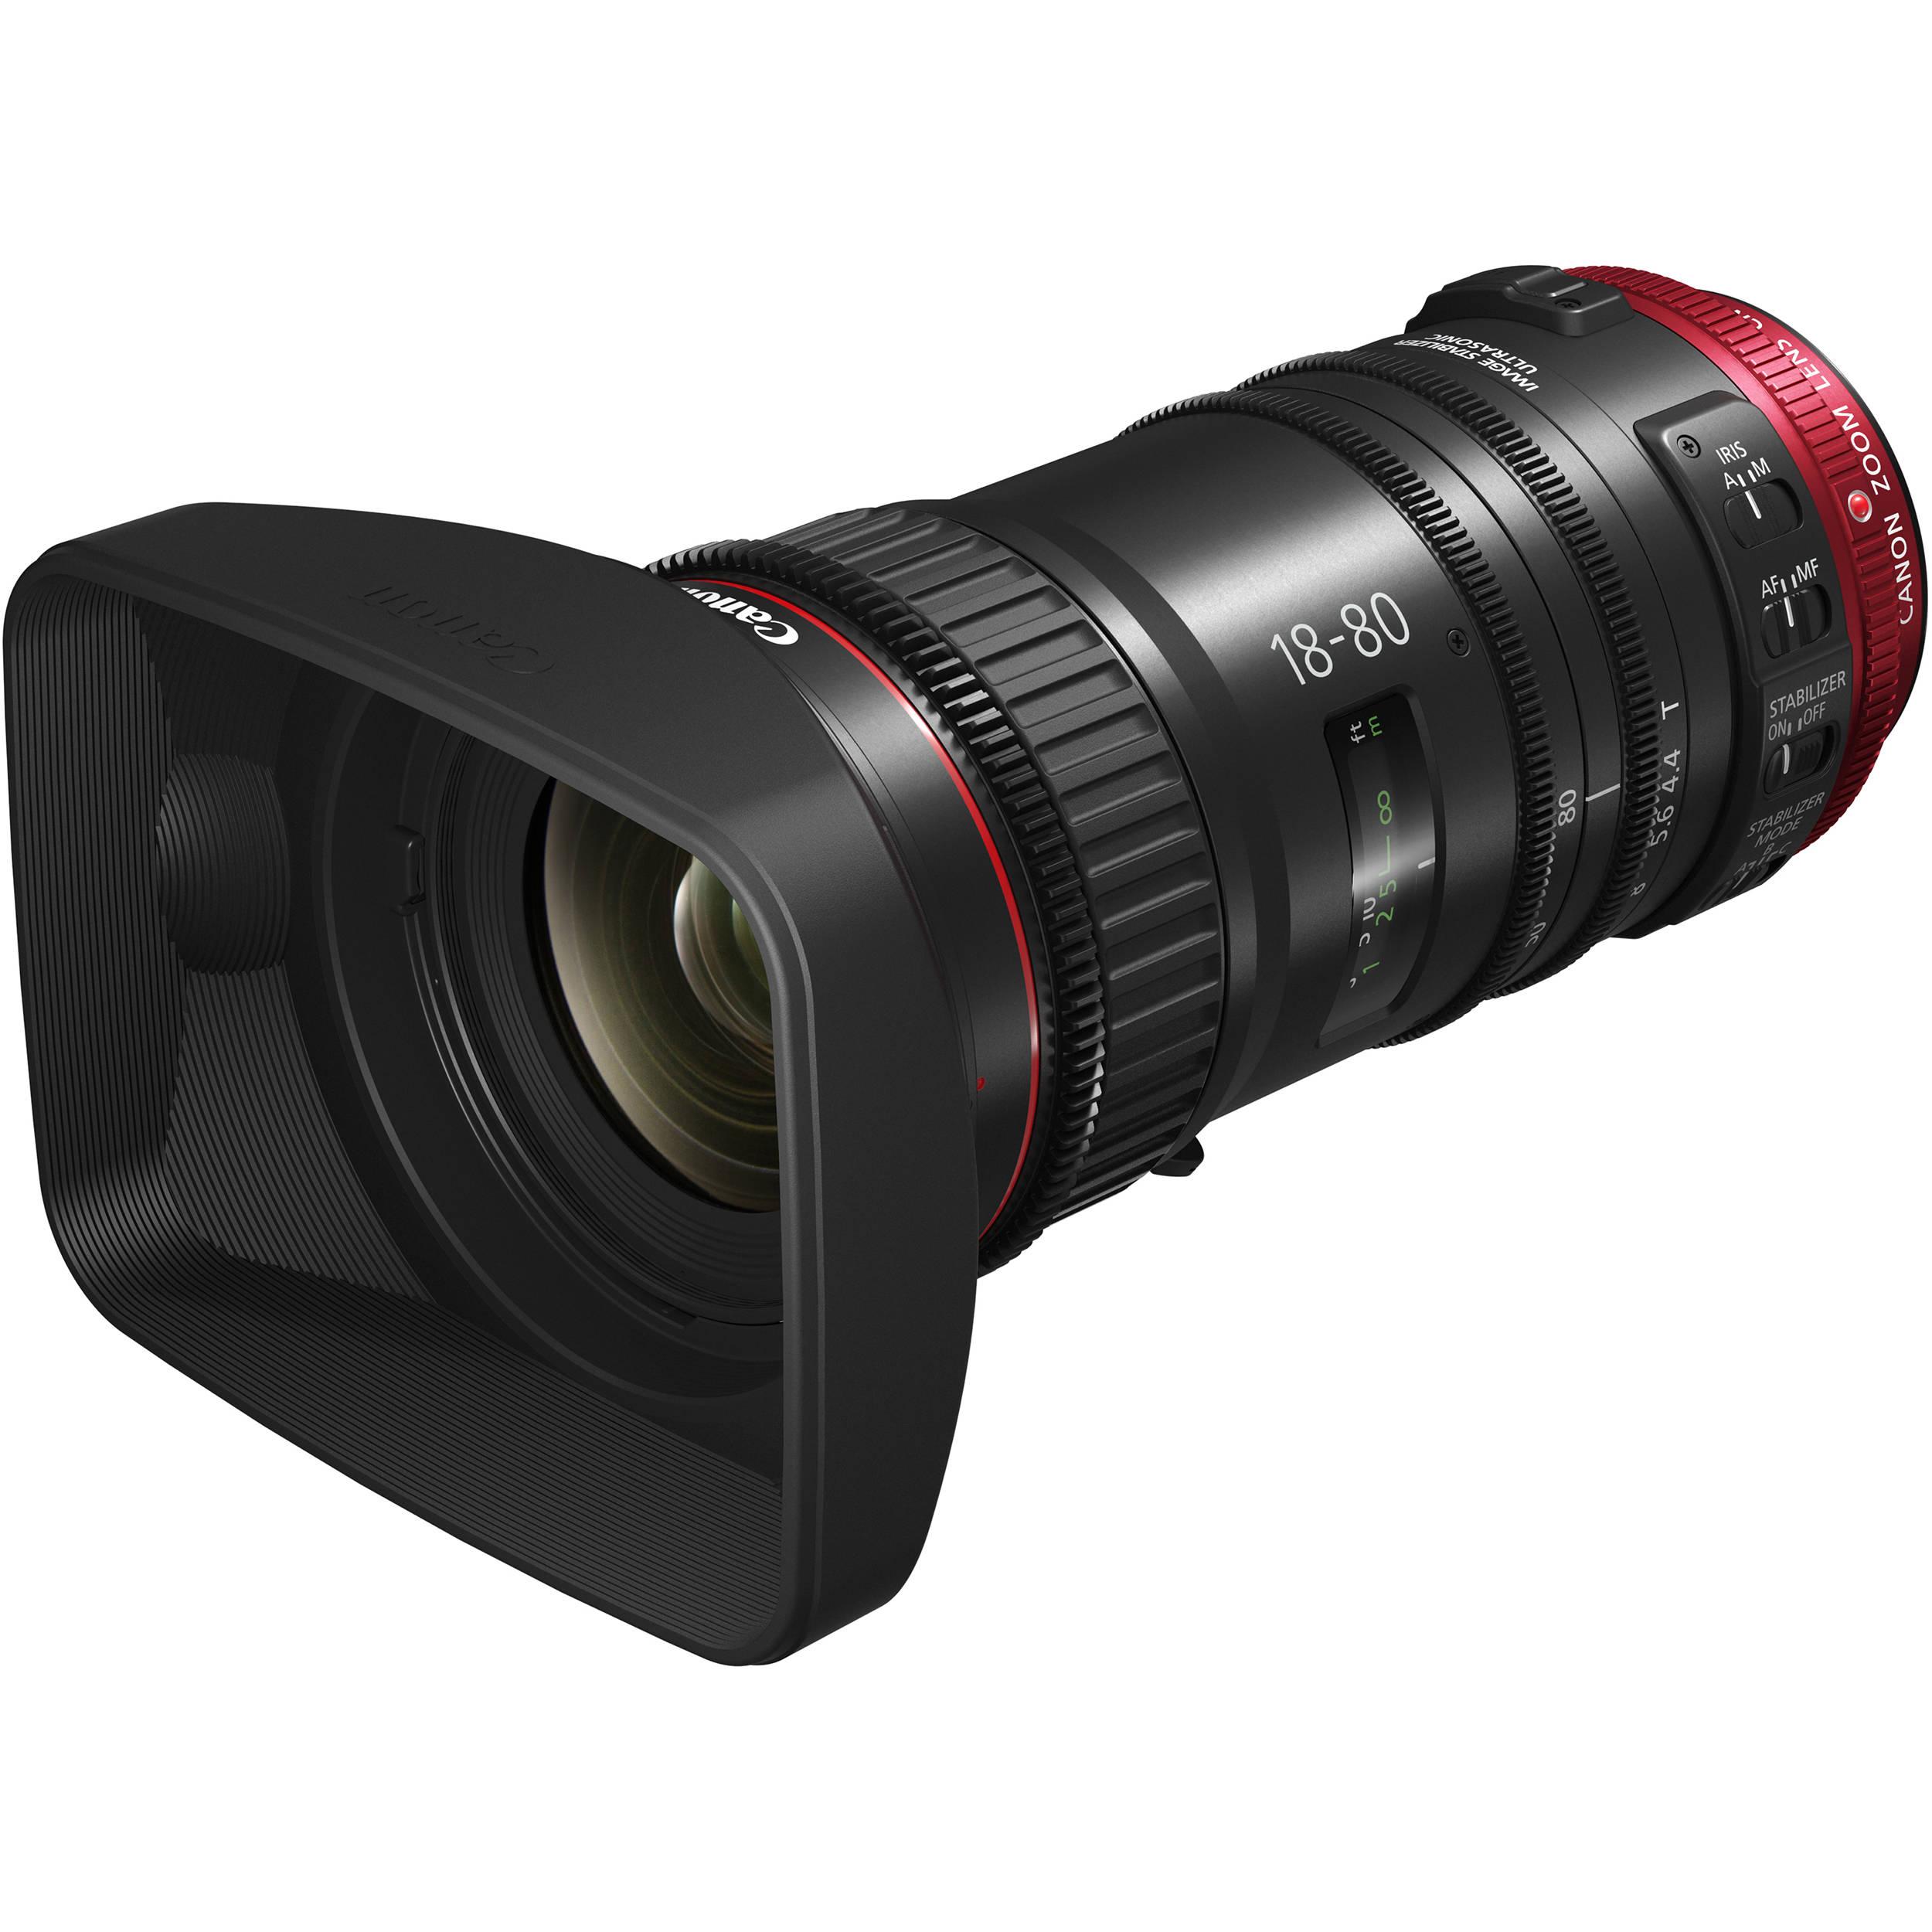 canon cn e 18 80mm t4 4 compact servo cinema zoom lens canon camcorder manuals hf r400 canon camcorder manuals hf r400